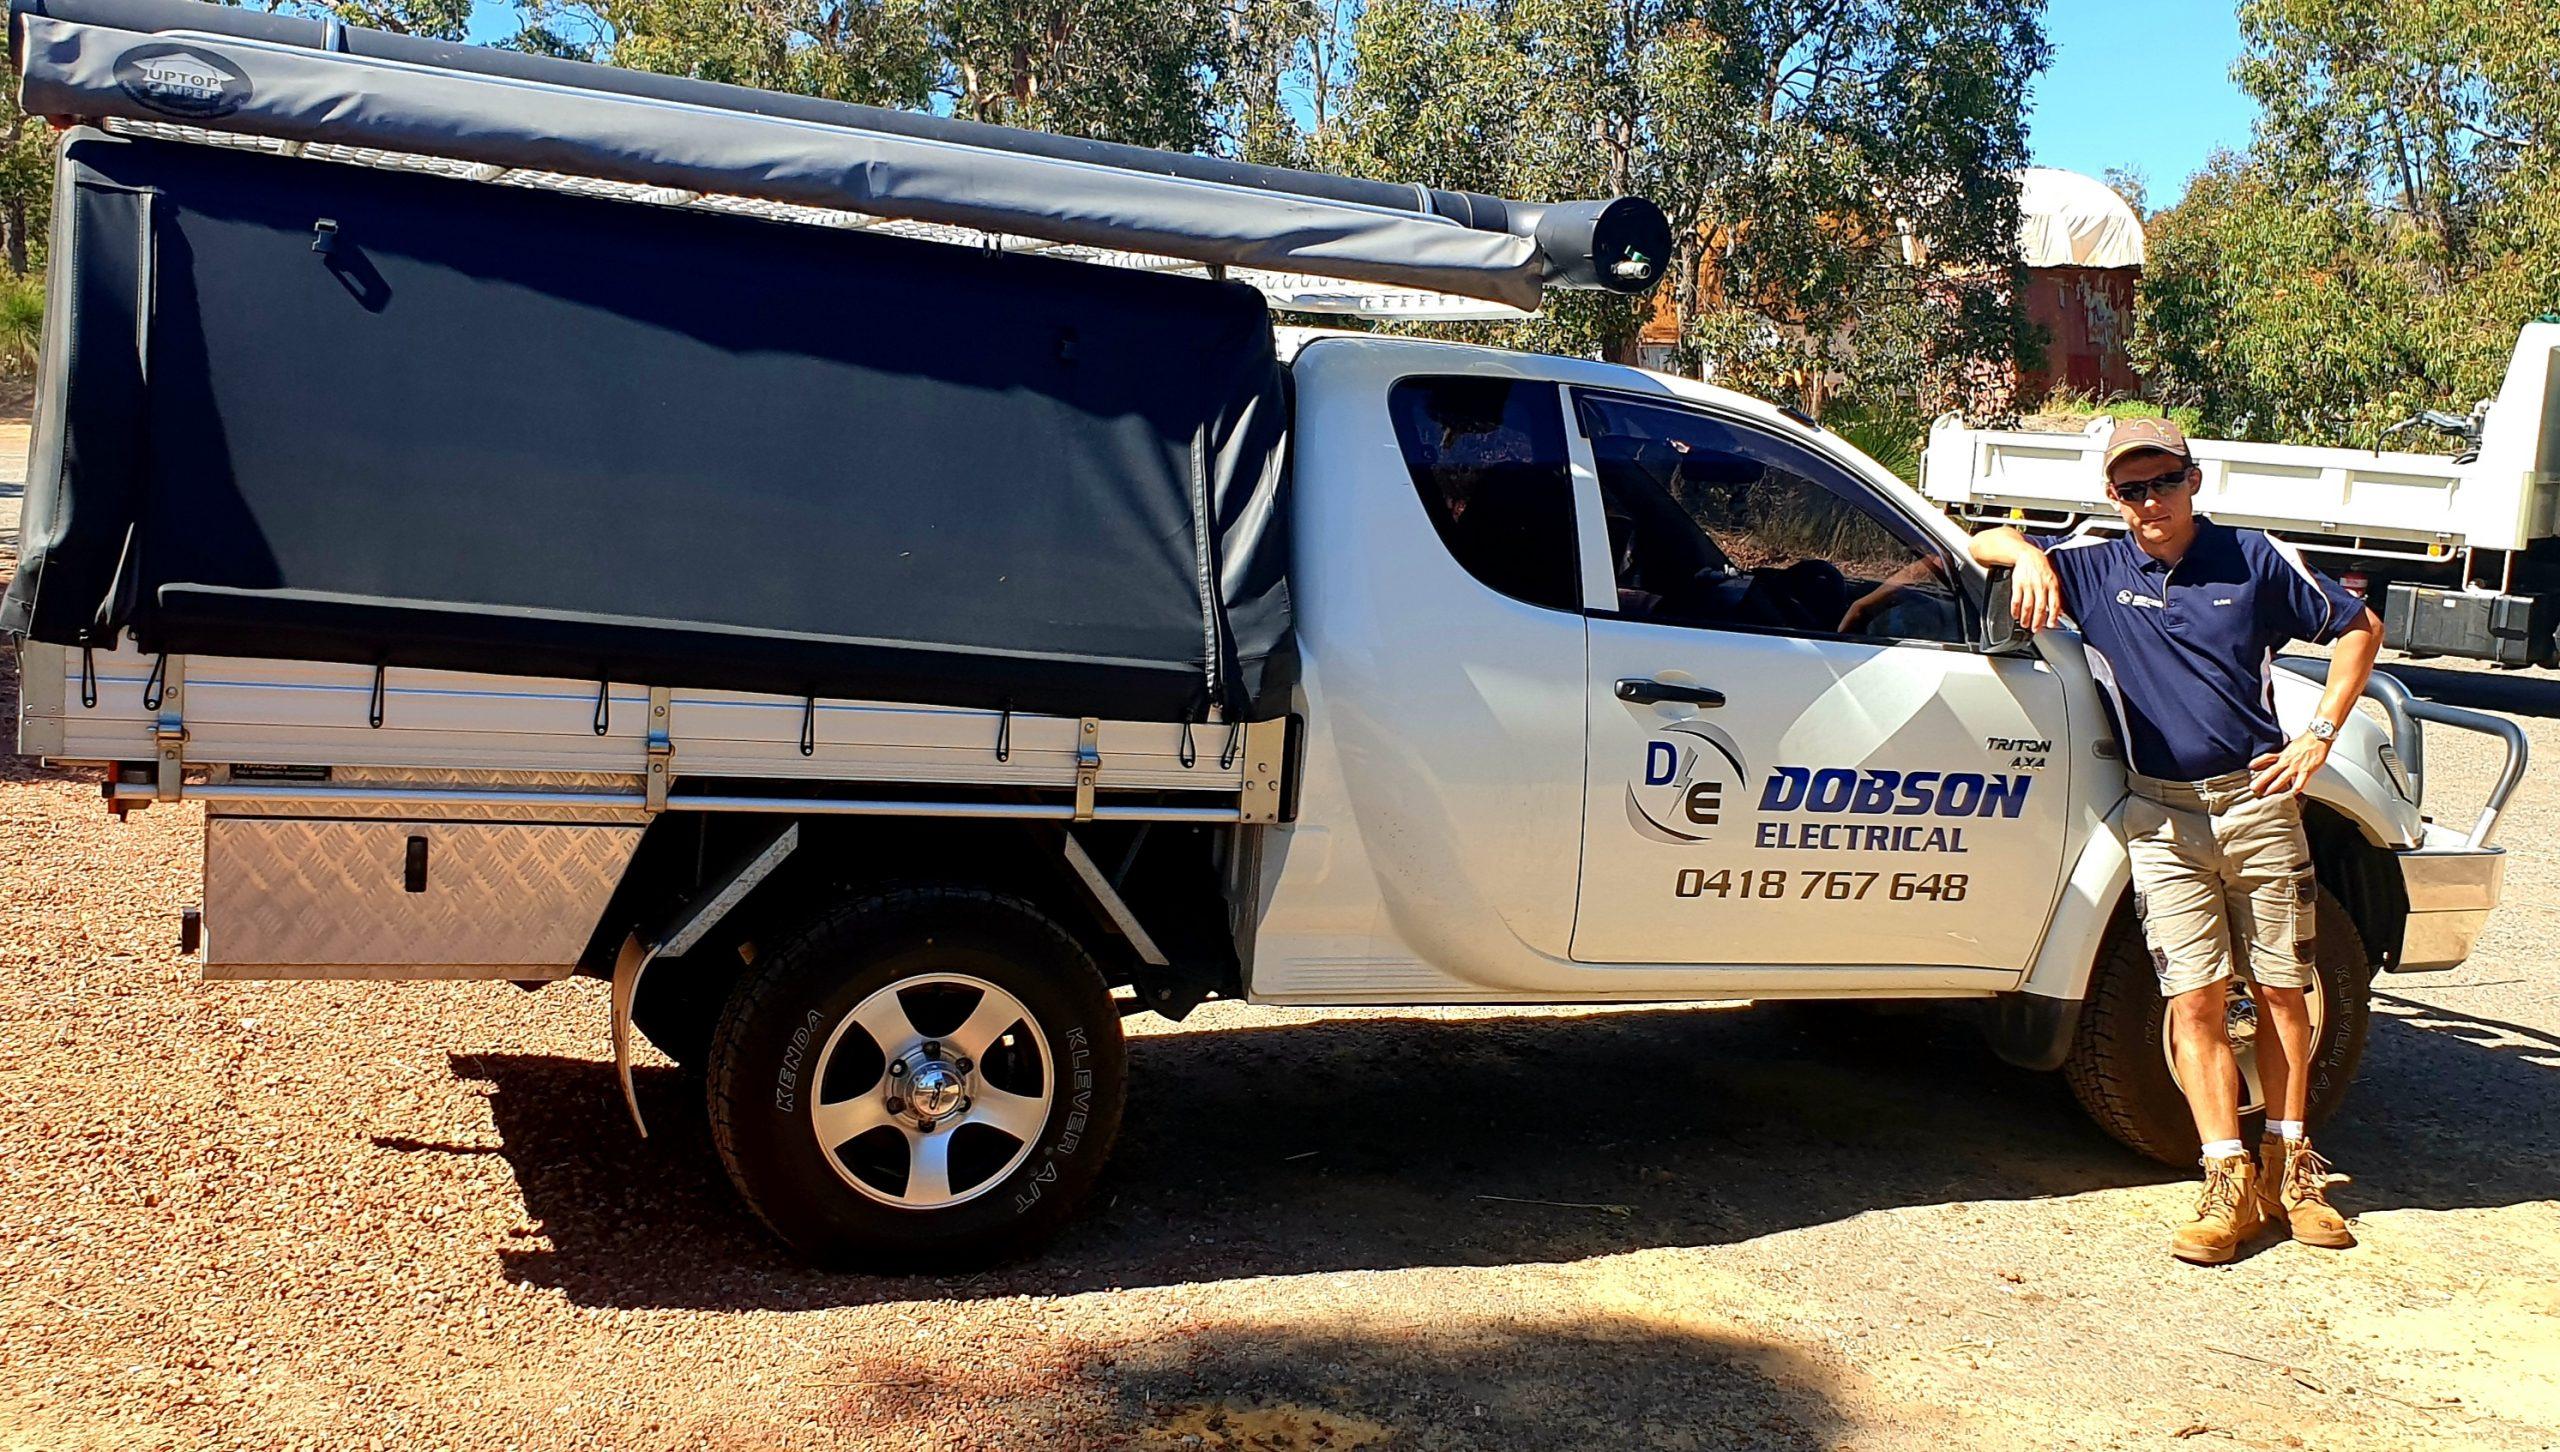 Dobson Electrical/Earthmoving